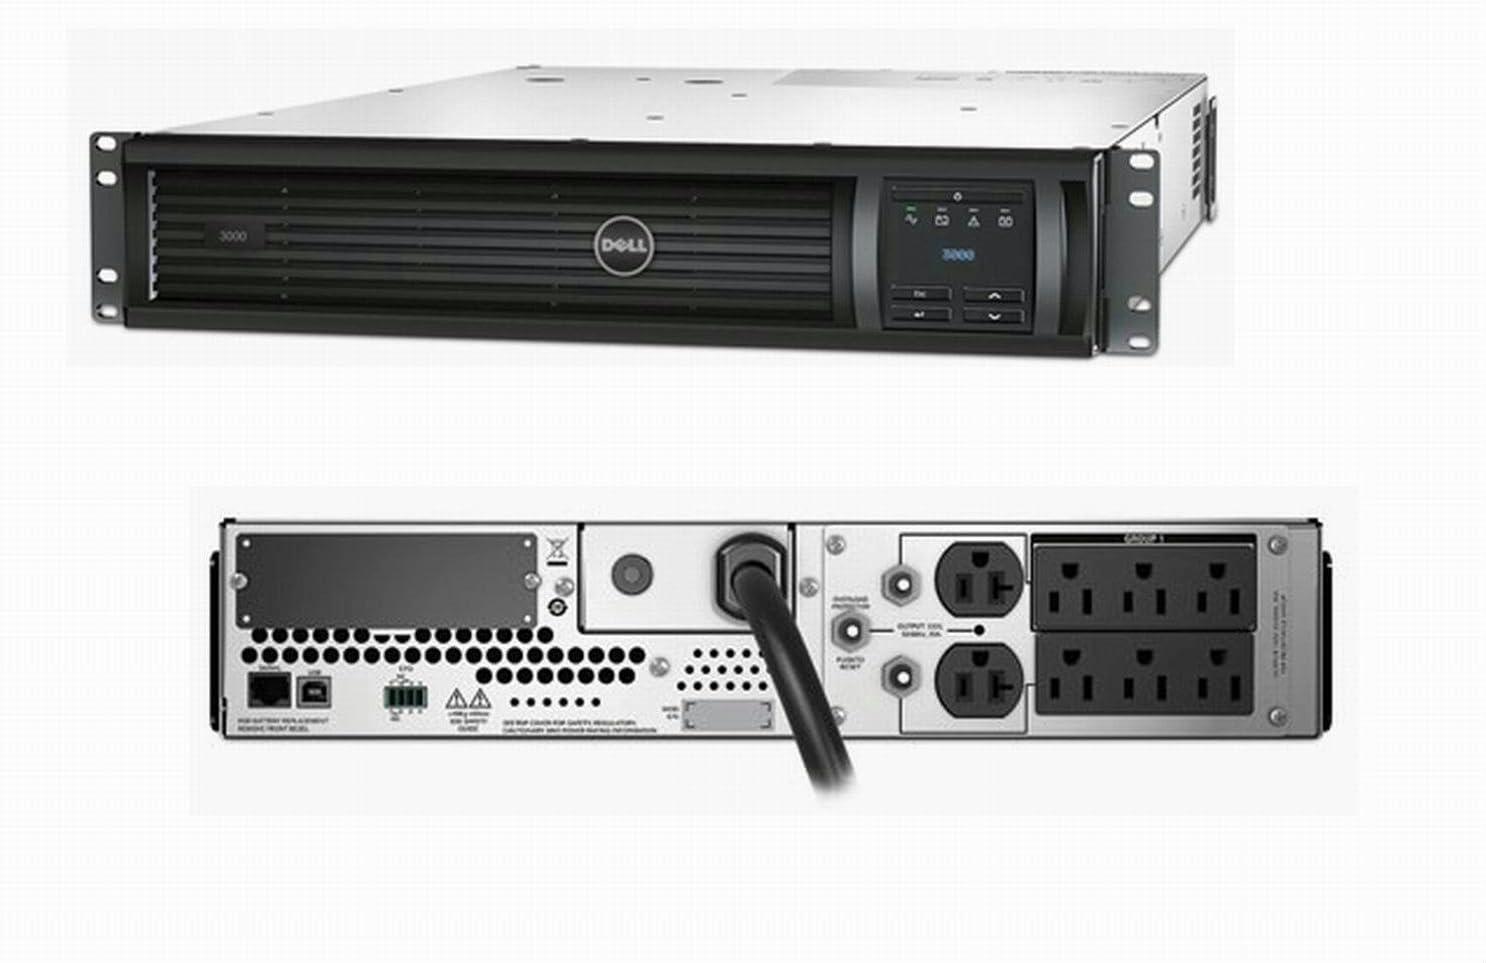 UPSBatteryCenter SMT3000RM2U APC Smart UPS 3000VA RM 2U LCD 120V SMT3000RM2U Compatible Battery Pack Replacement